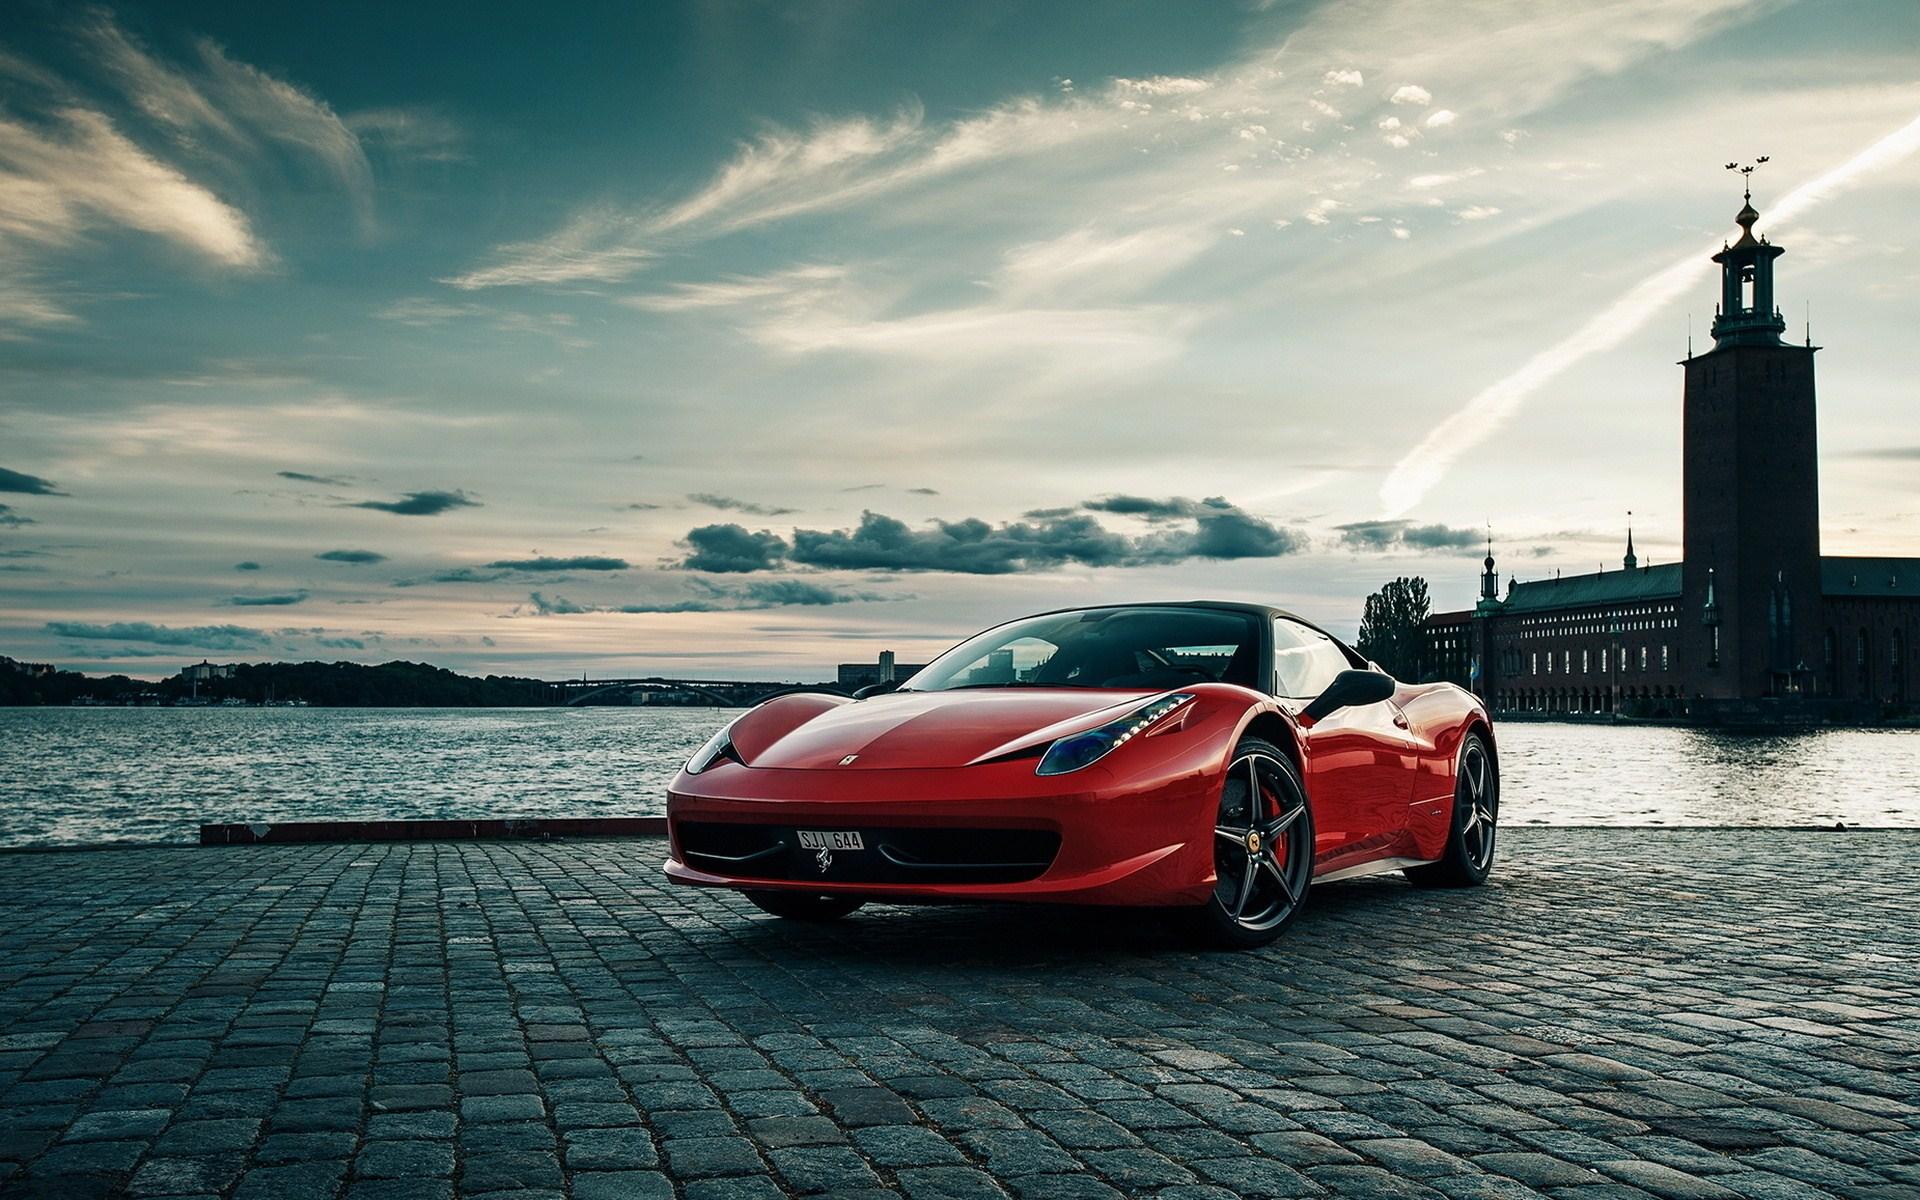 Gorgeous Ferrari Wallpaper